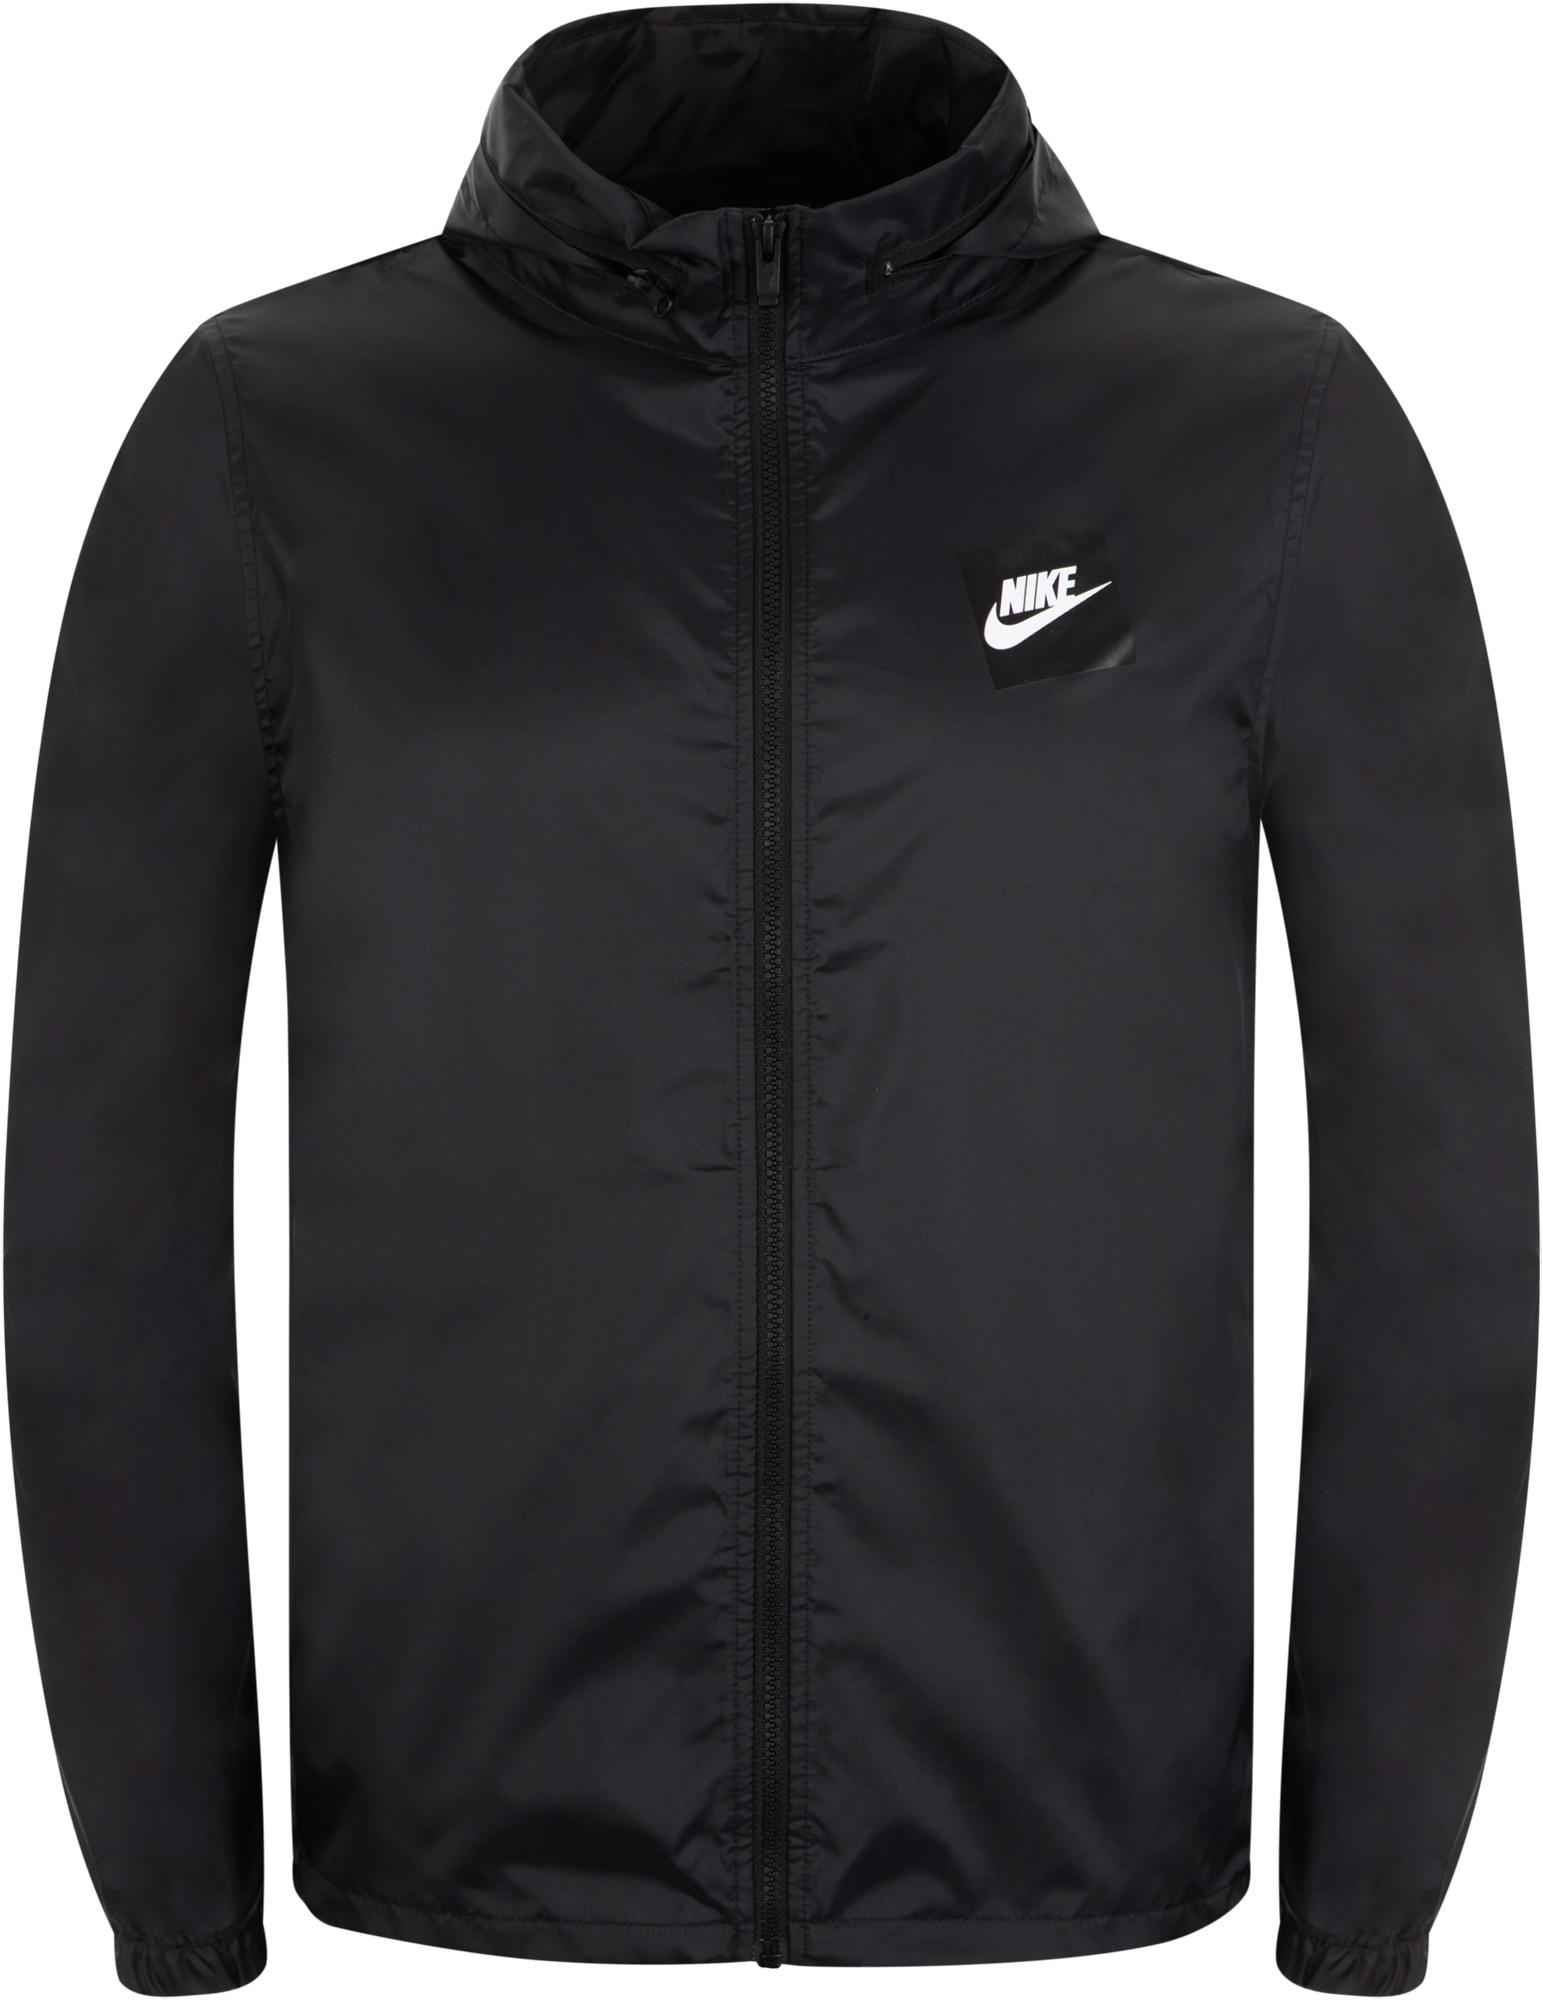 Nike Ветровка мужская Sportswear JDI, размер 52-54